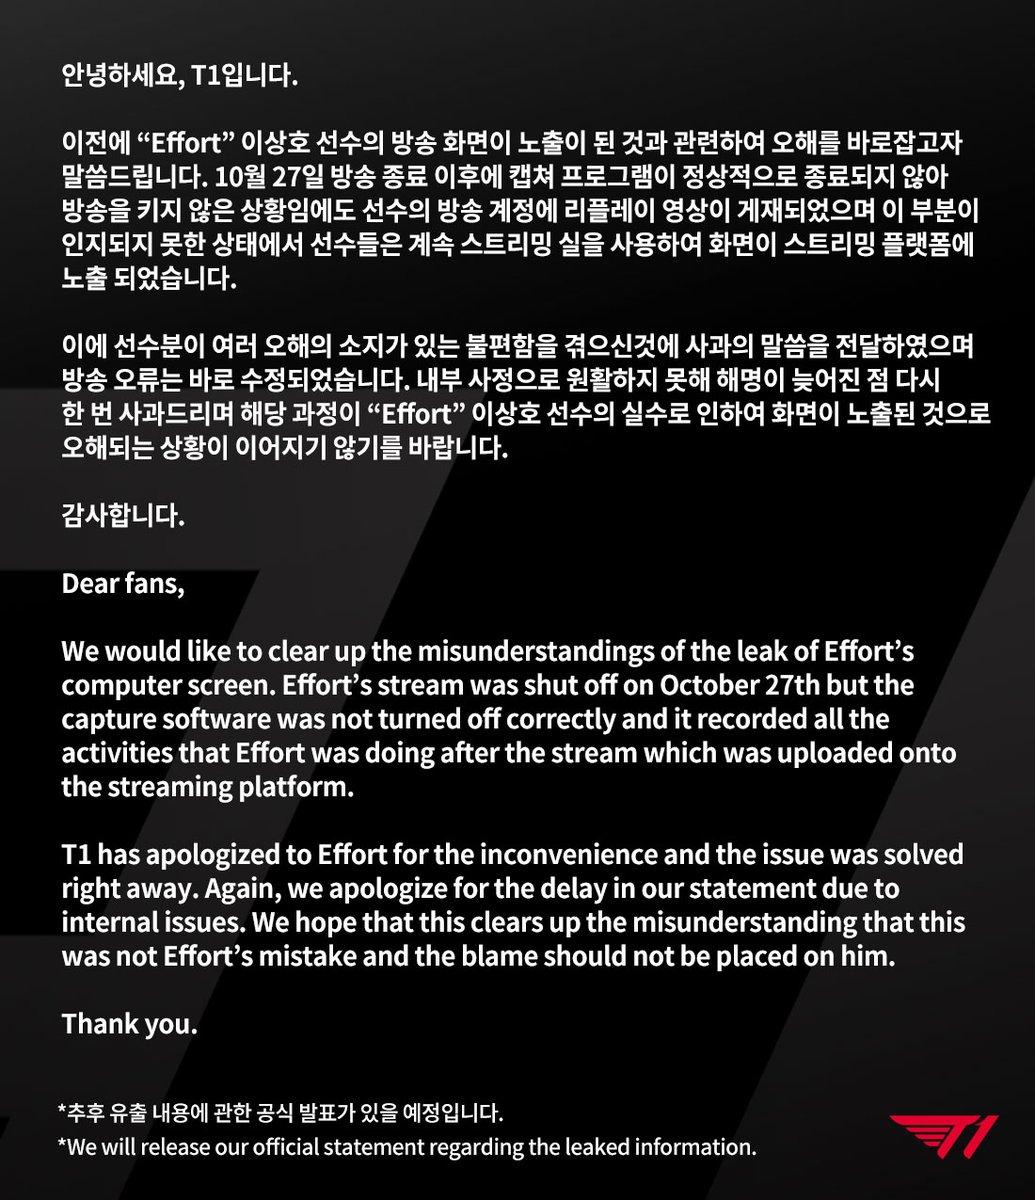 "lol_Khan - ""Effort"" 이상호 선수에게 사과드립니다. Official Apology to Effort."